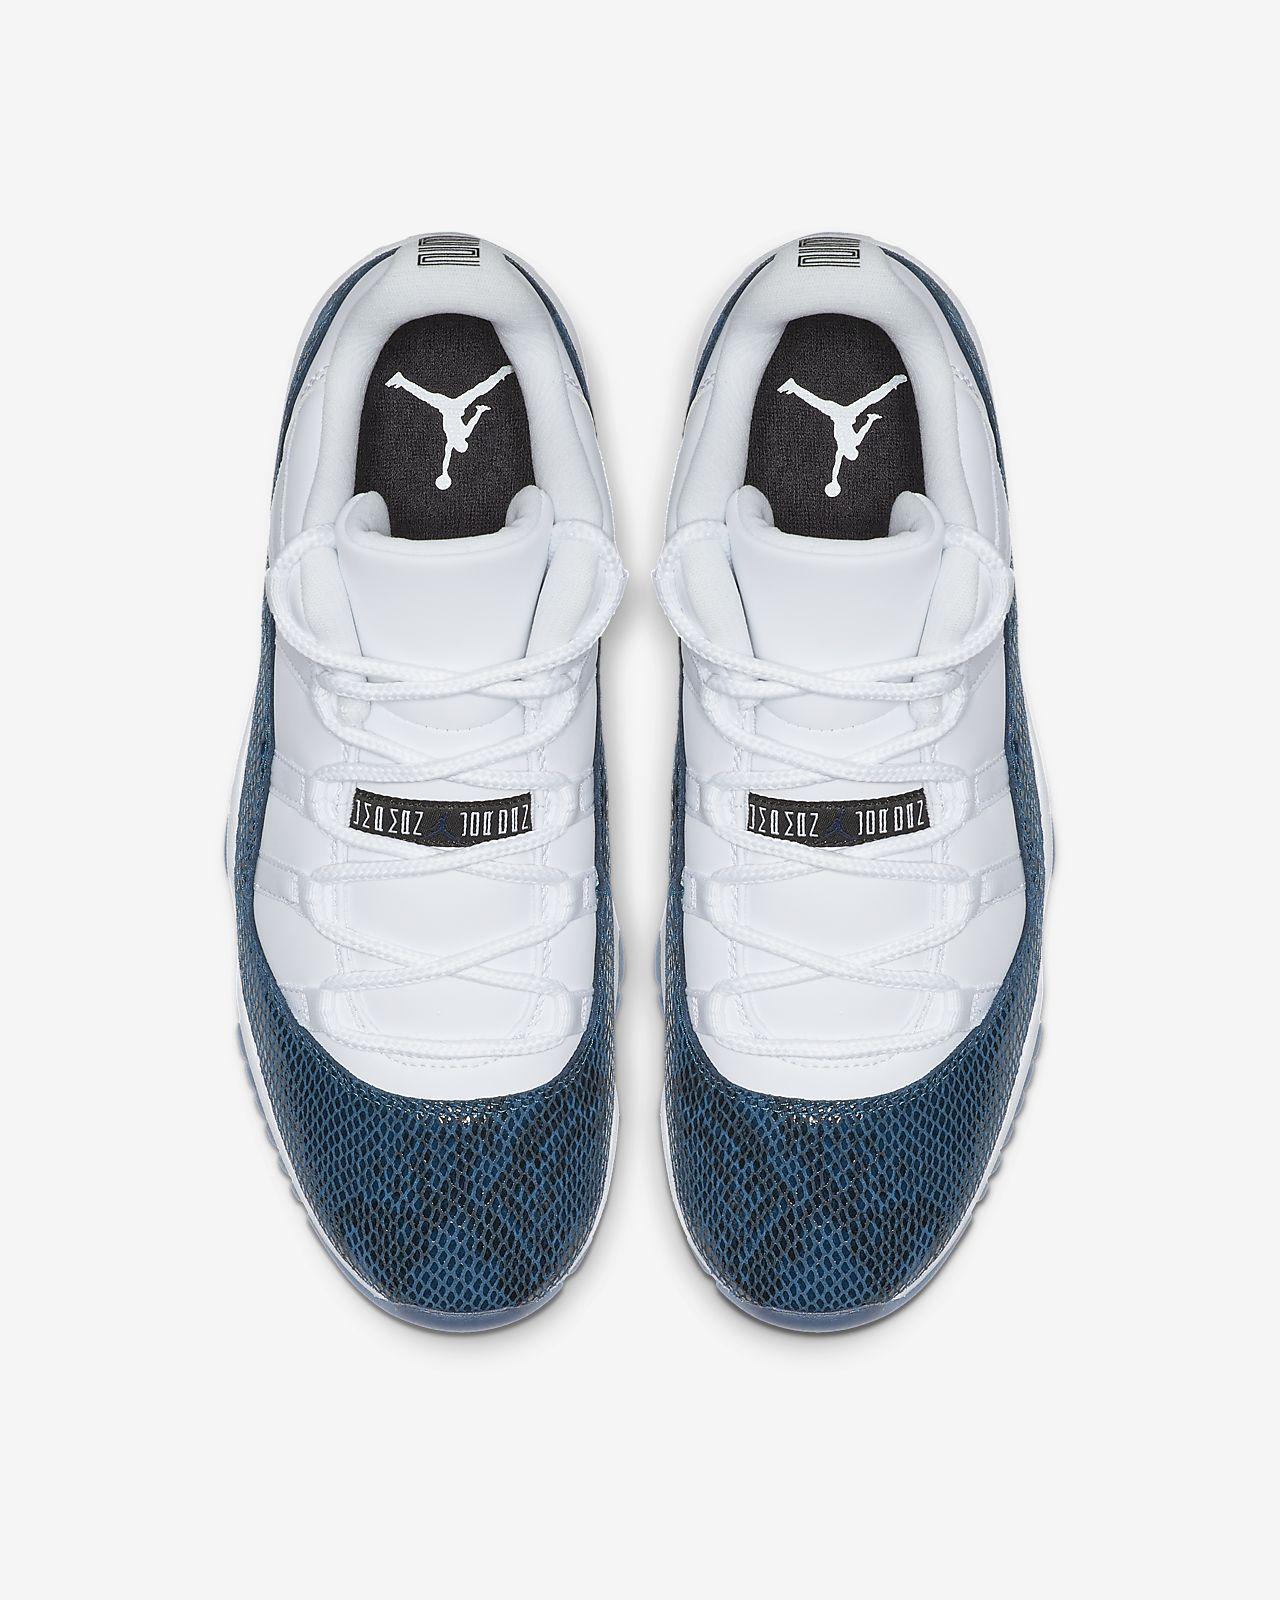 9488bfb4eb Air Jordan 11 Retro Low LE Men's Shoe